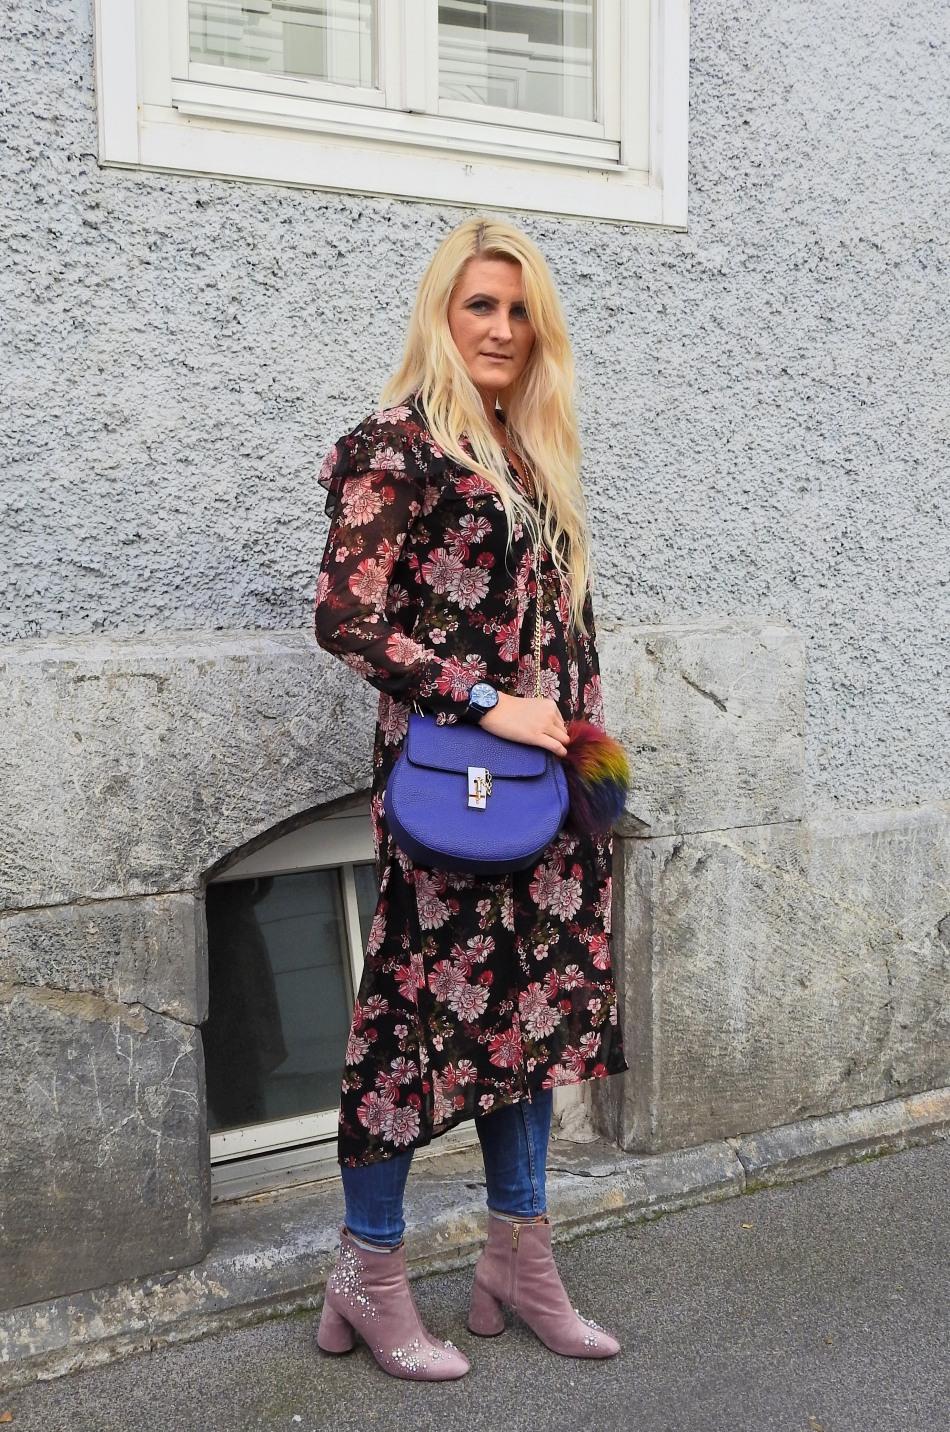 Velvet-Booties-Shoes-Shoelover-Shoeaddict-Tunika-Blouse-Chloe-Drew-Bag-carrieslifestyle-Tamara-PRutsch